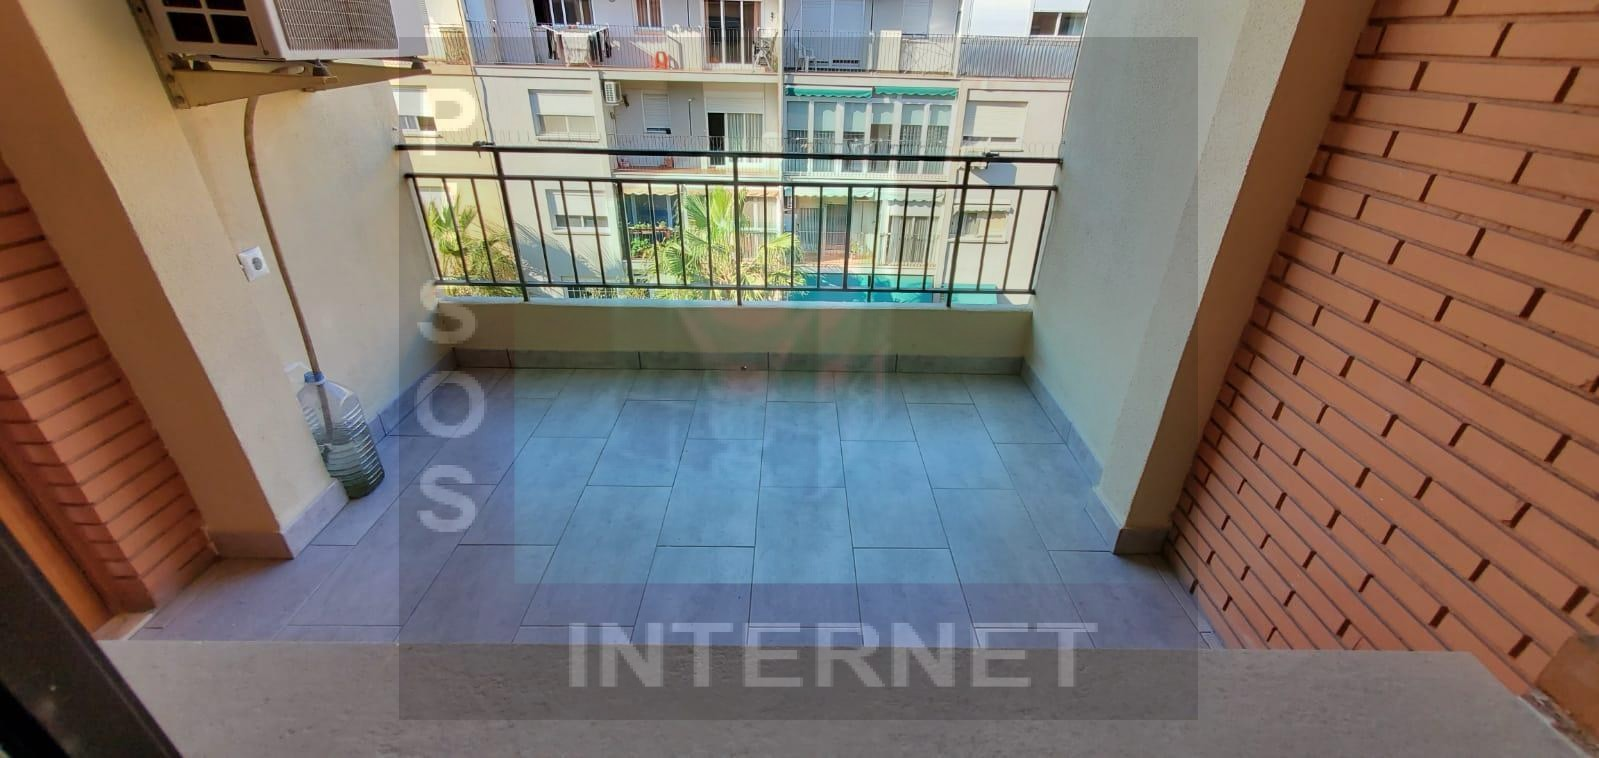 Alquiler de piso en La saidia